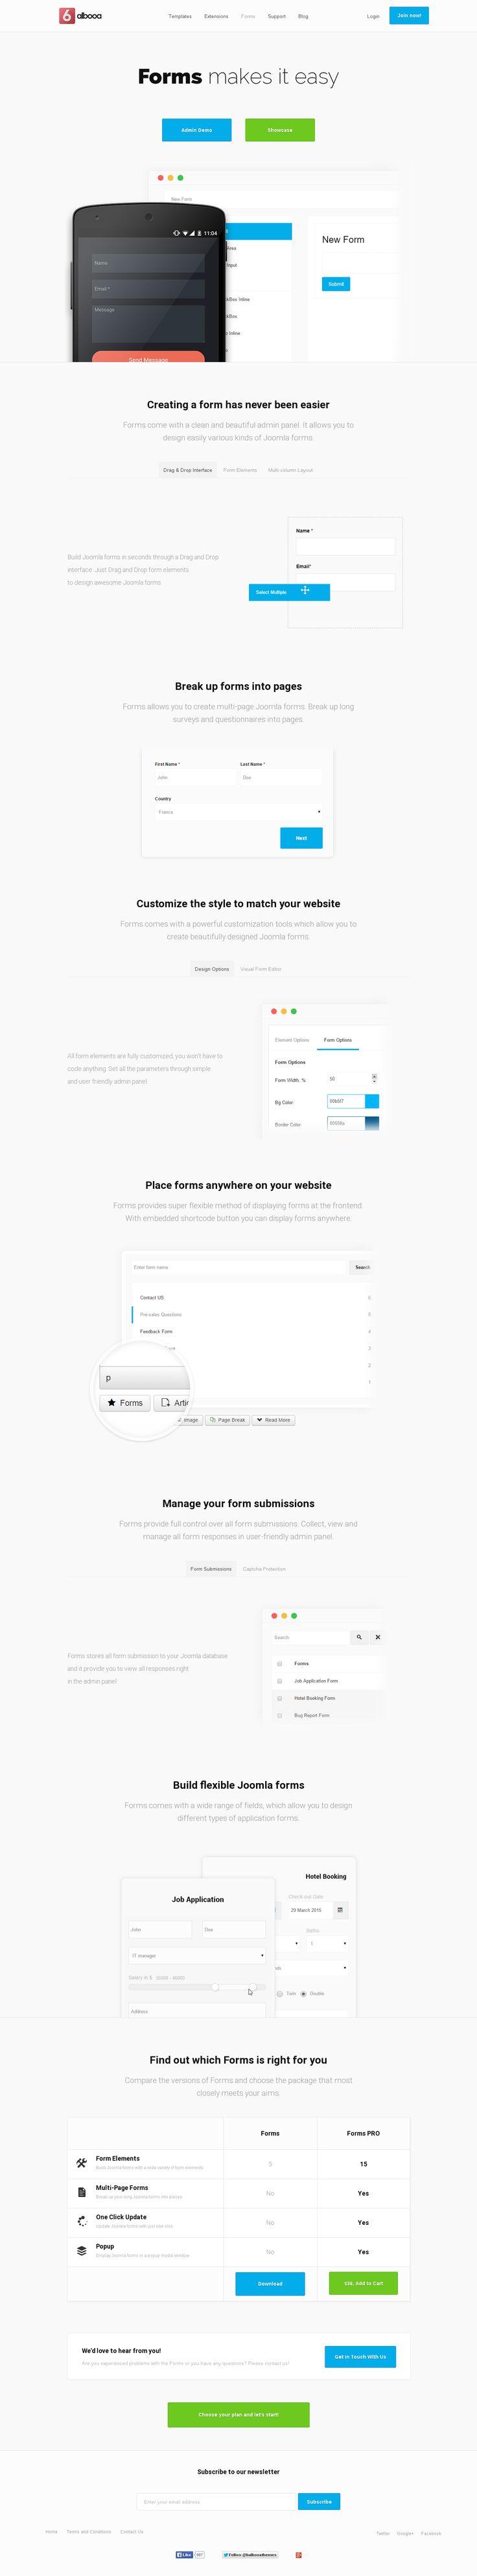 Forms - Joomla Drag and Drop Form builder, Landing Page, Balbooa.com  #landingpage #landingpagedesign #joomla #joomlaforms #forms